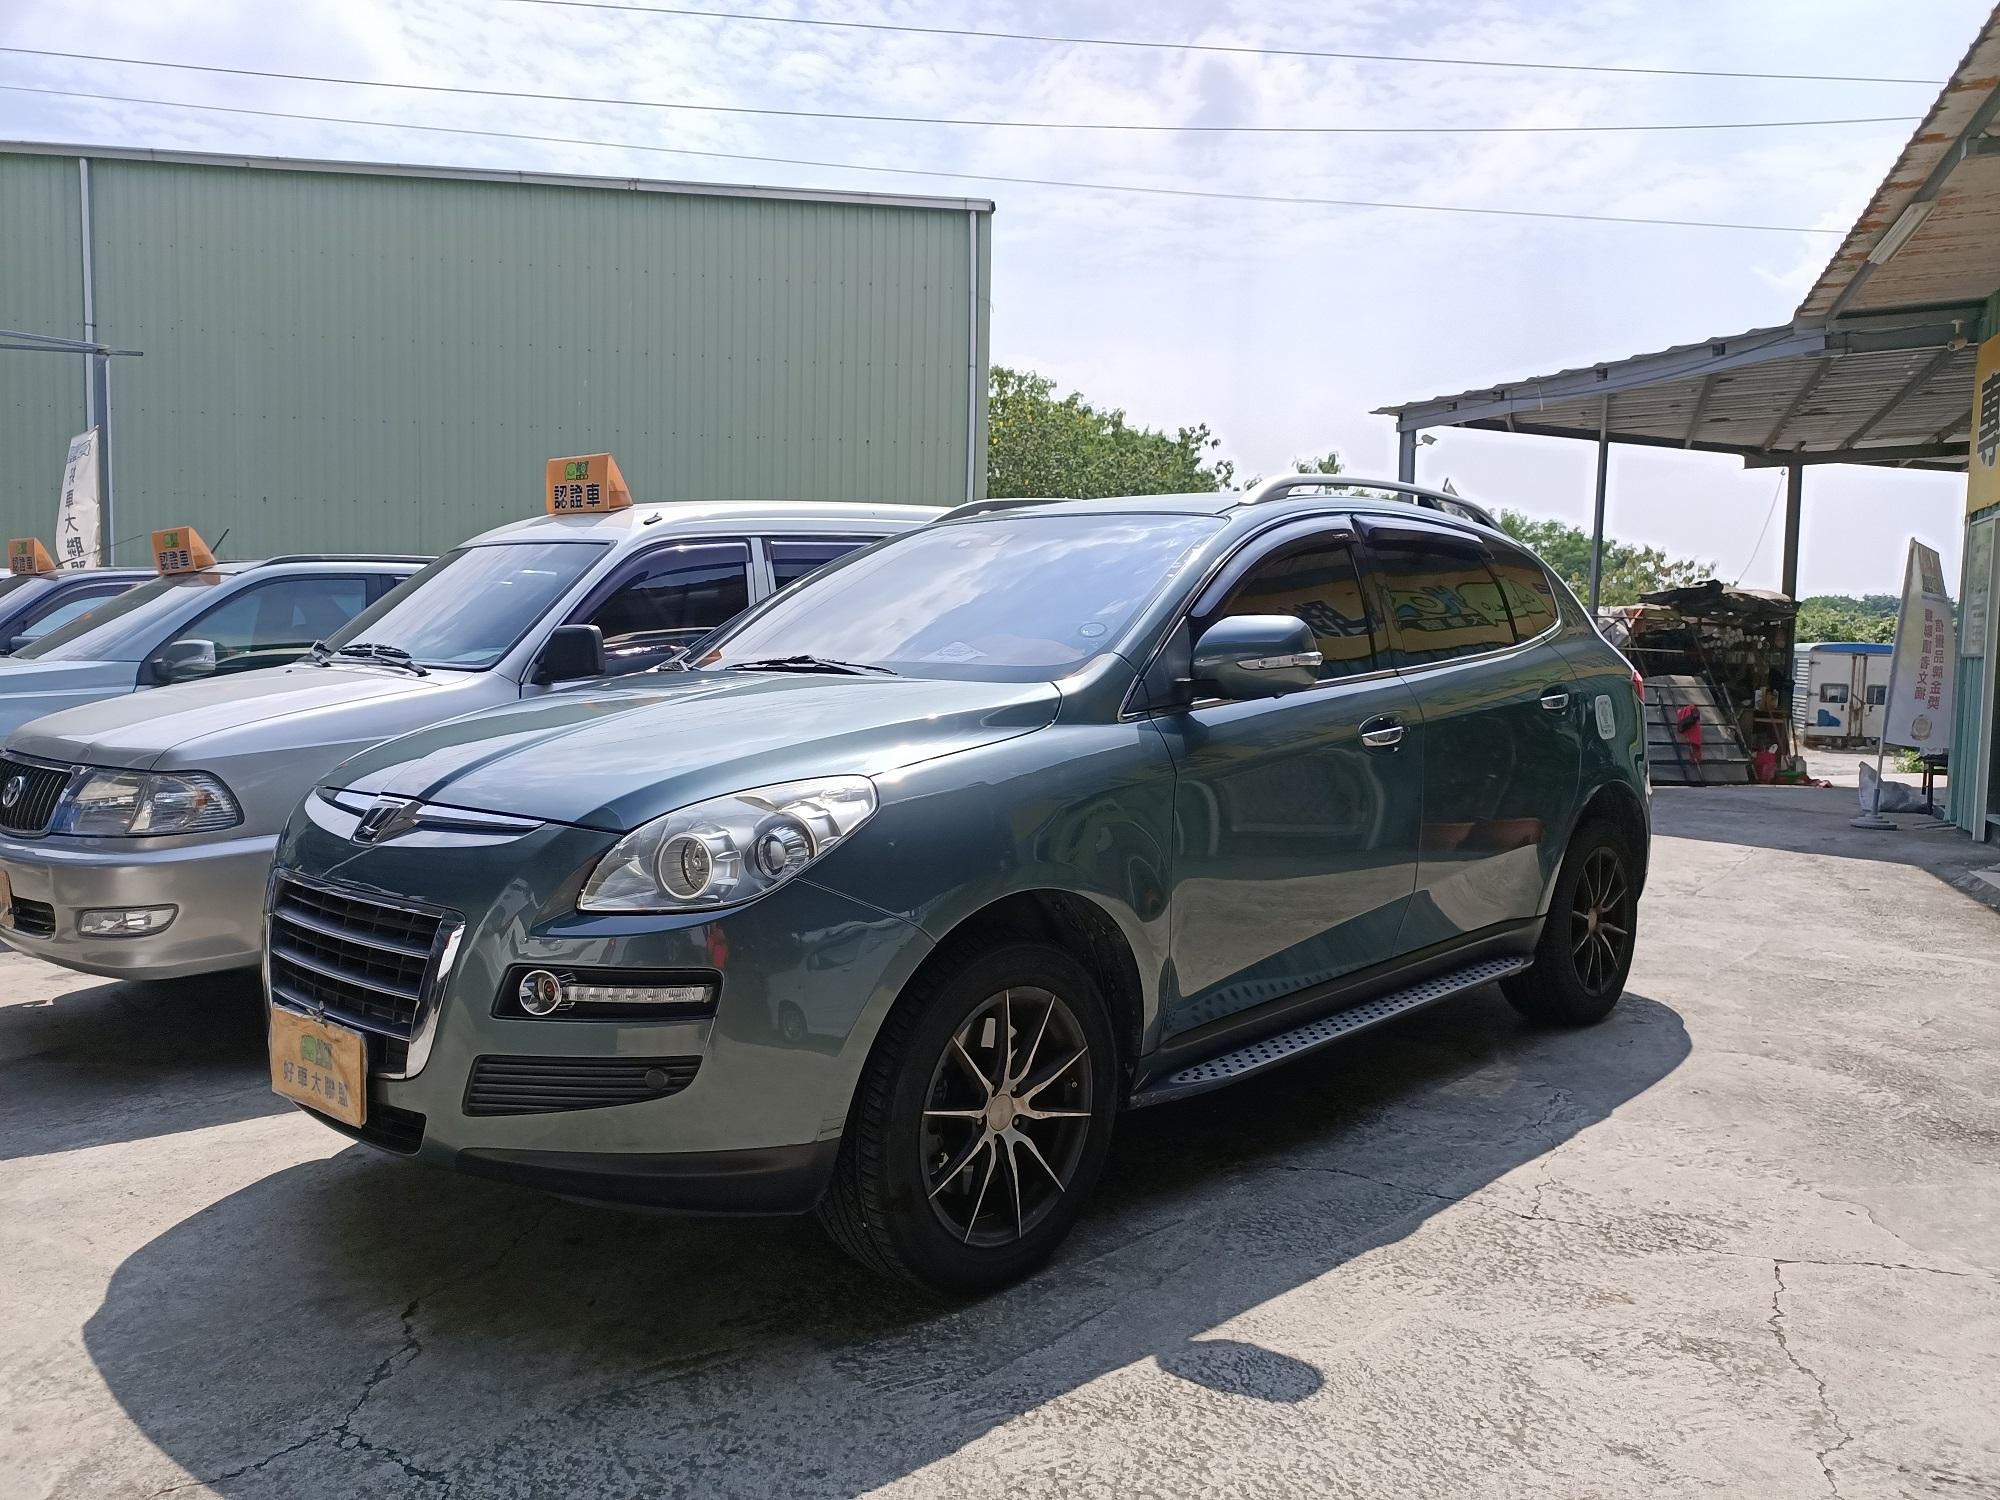 2010 Luxgen 納智捷 U7 turbo